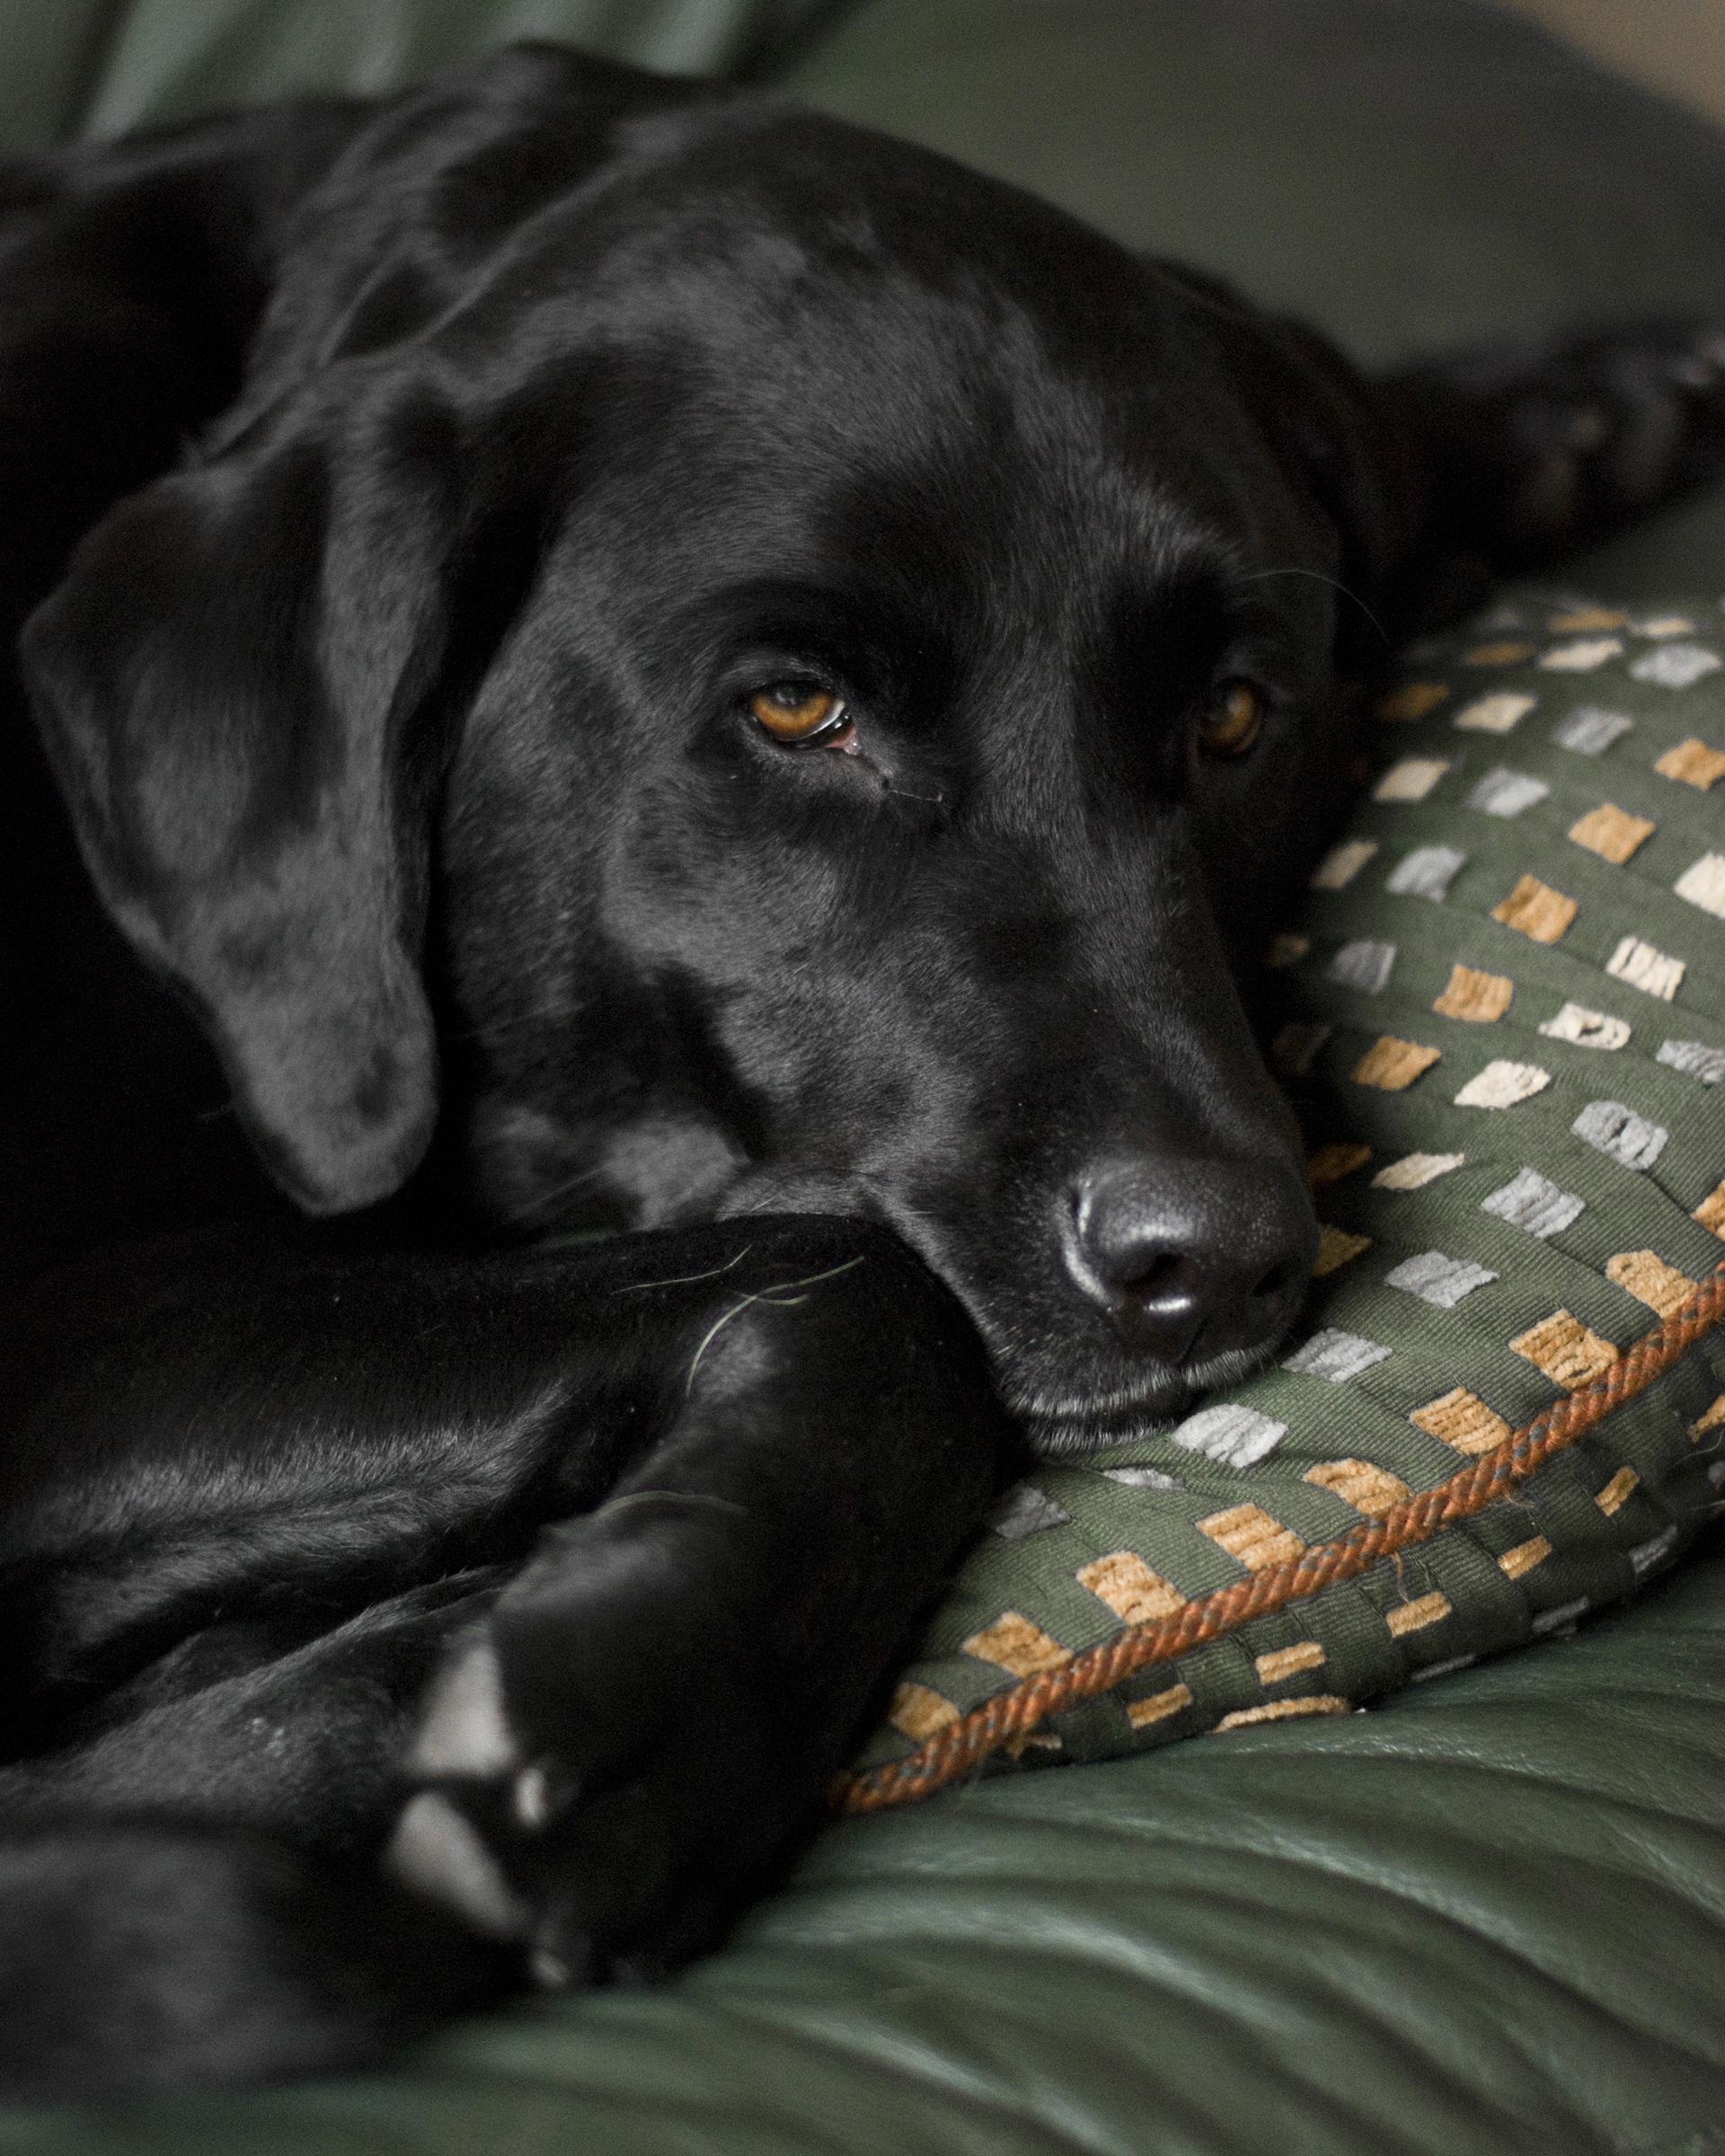 Most Inspiring Lab Black Adorable Dog - puppy-dog-animal-cute-canine-pet-young-mammal-black-couch-friend-vertebrate-labrador-retriever-domestic-adorable-labrador-retriever-breed-doggy-lab-purebred-black-lab-dog-like-mammal-870166  Snapshot_191762  .jpg